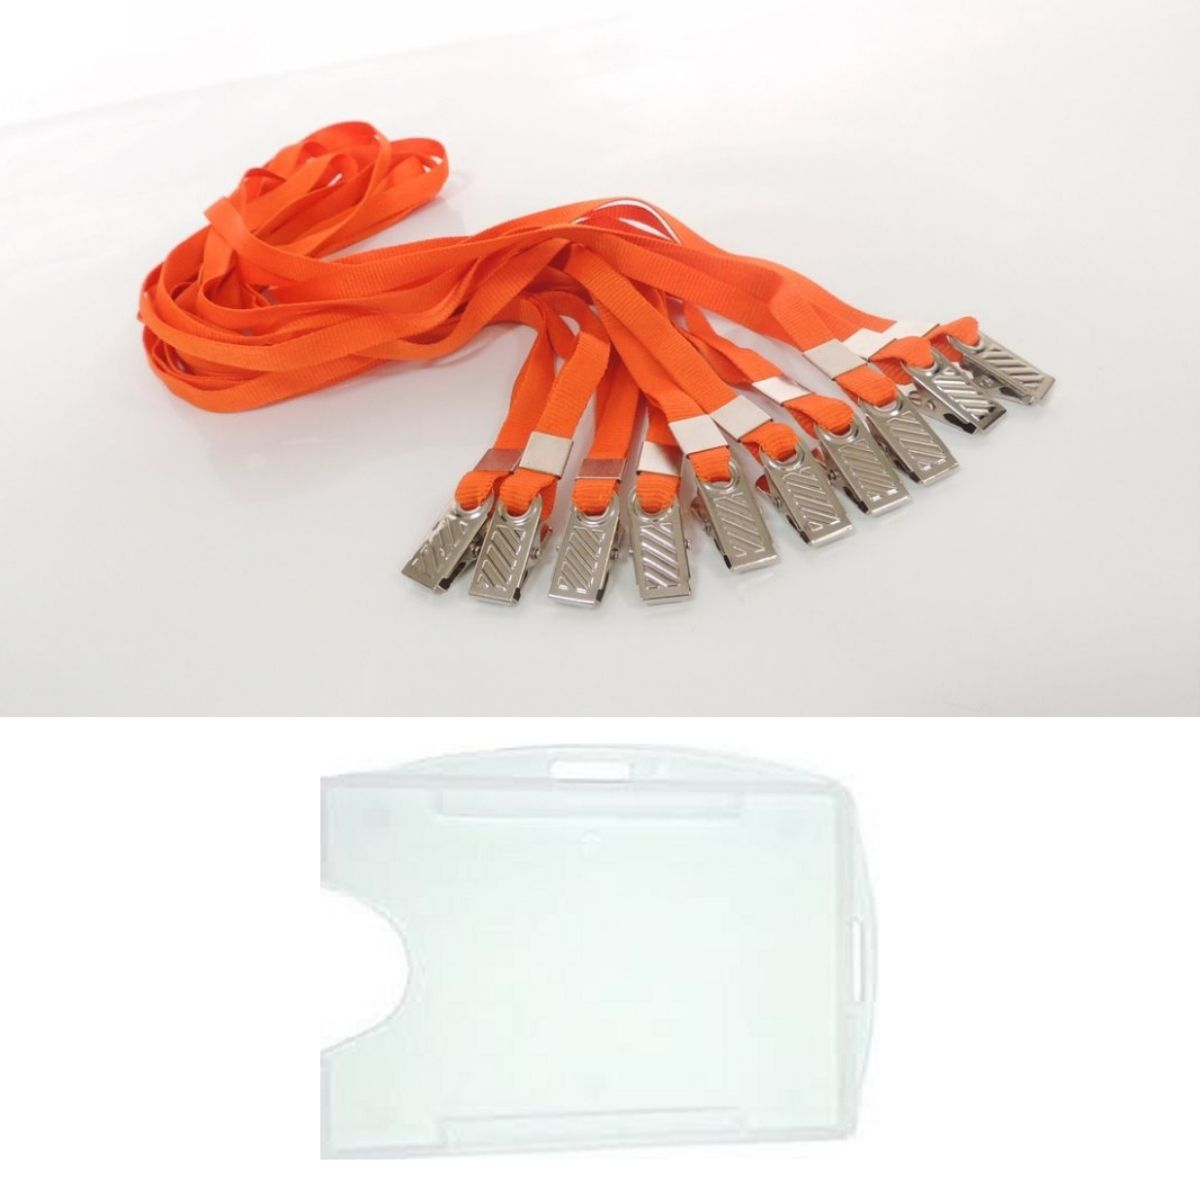 Kit Porta Crachá Rígido Conjugado Cristal + Cordão Laranja - 100 unidades  - Click Suprimentos